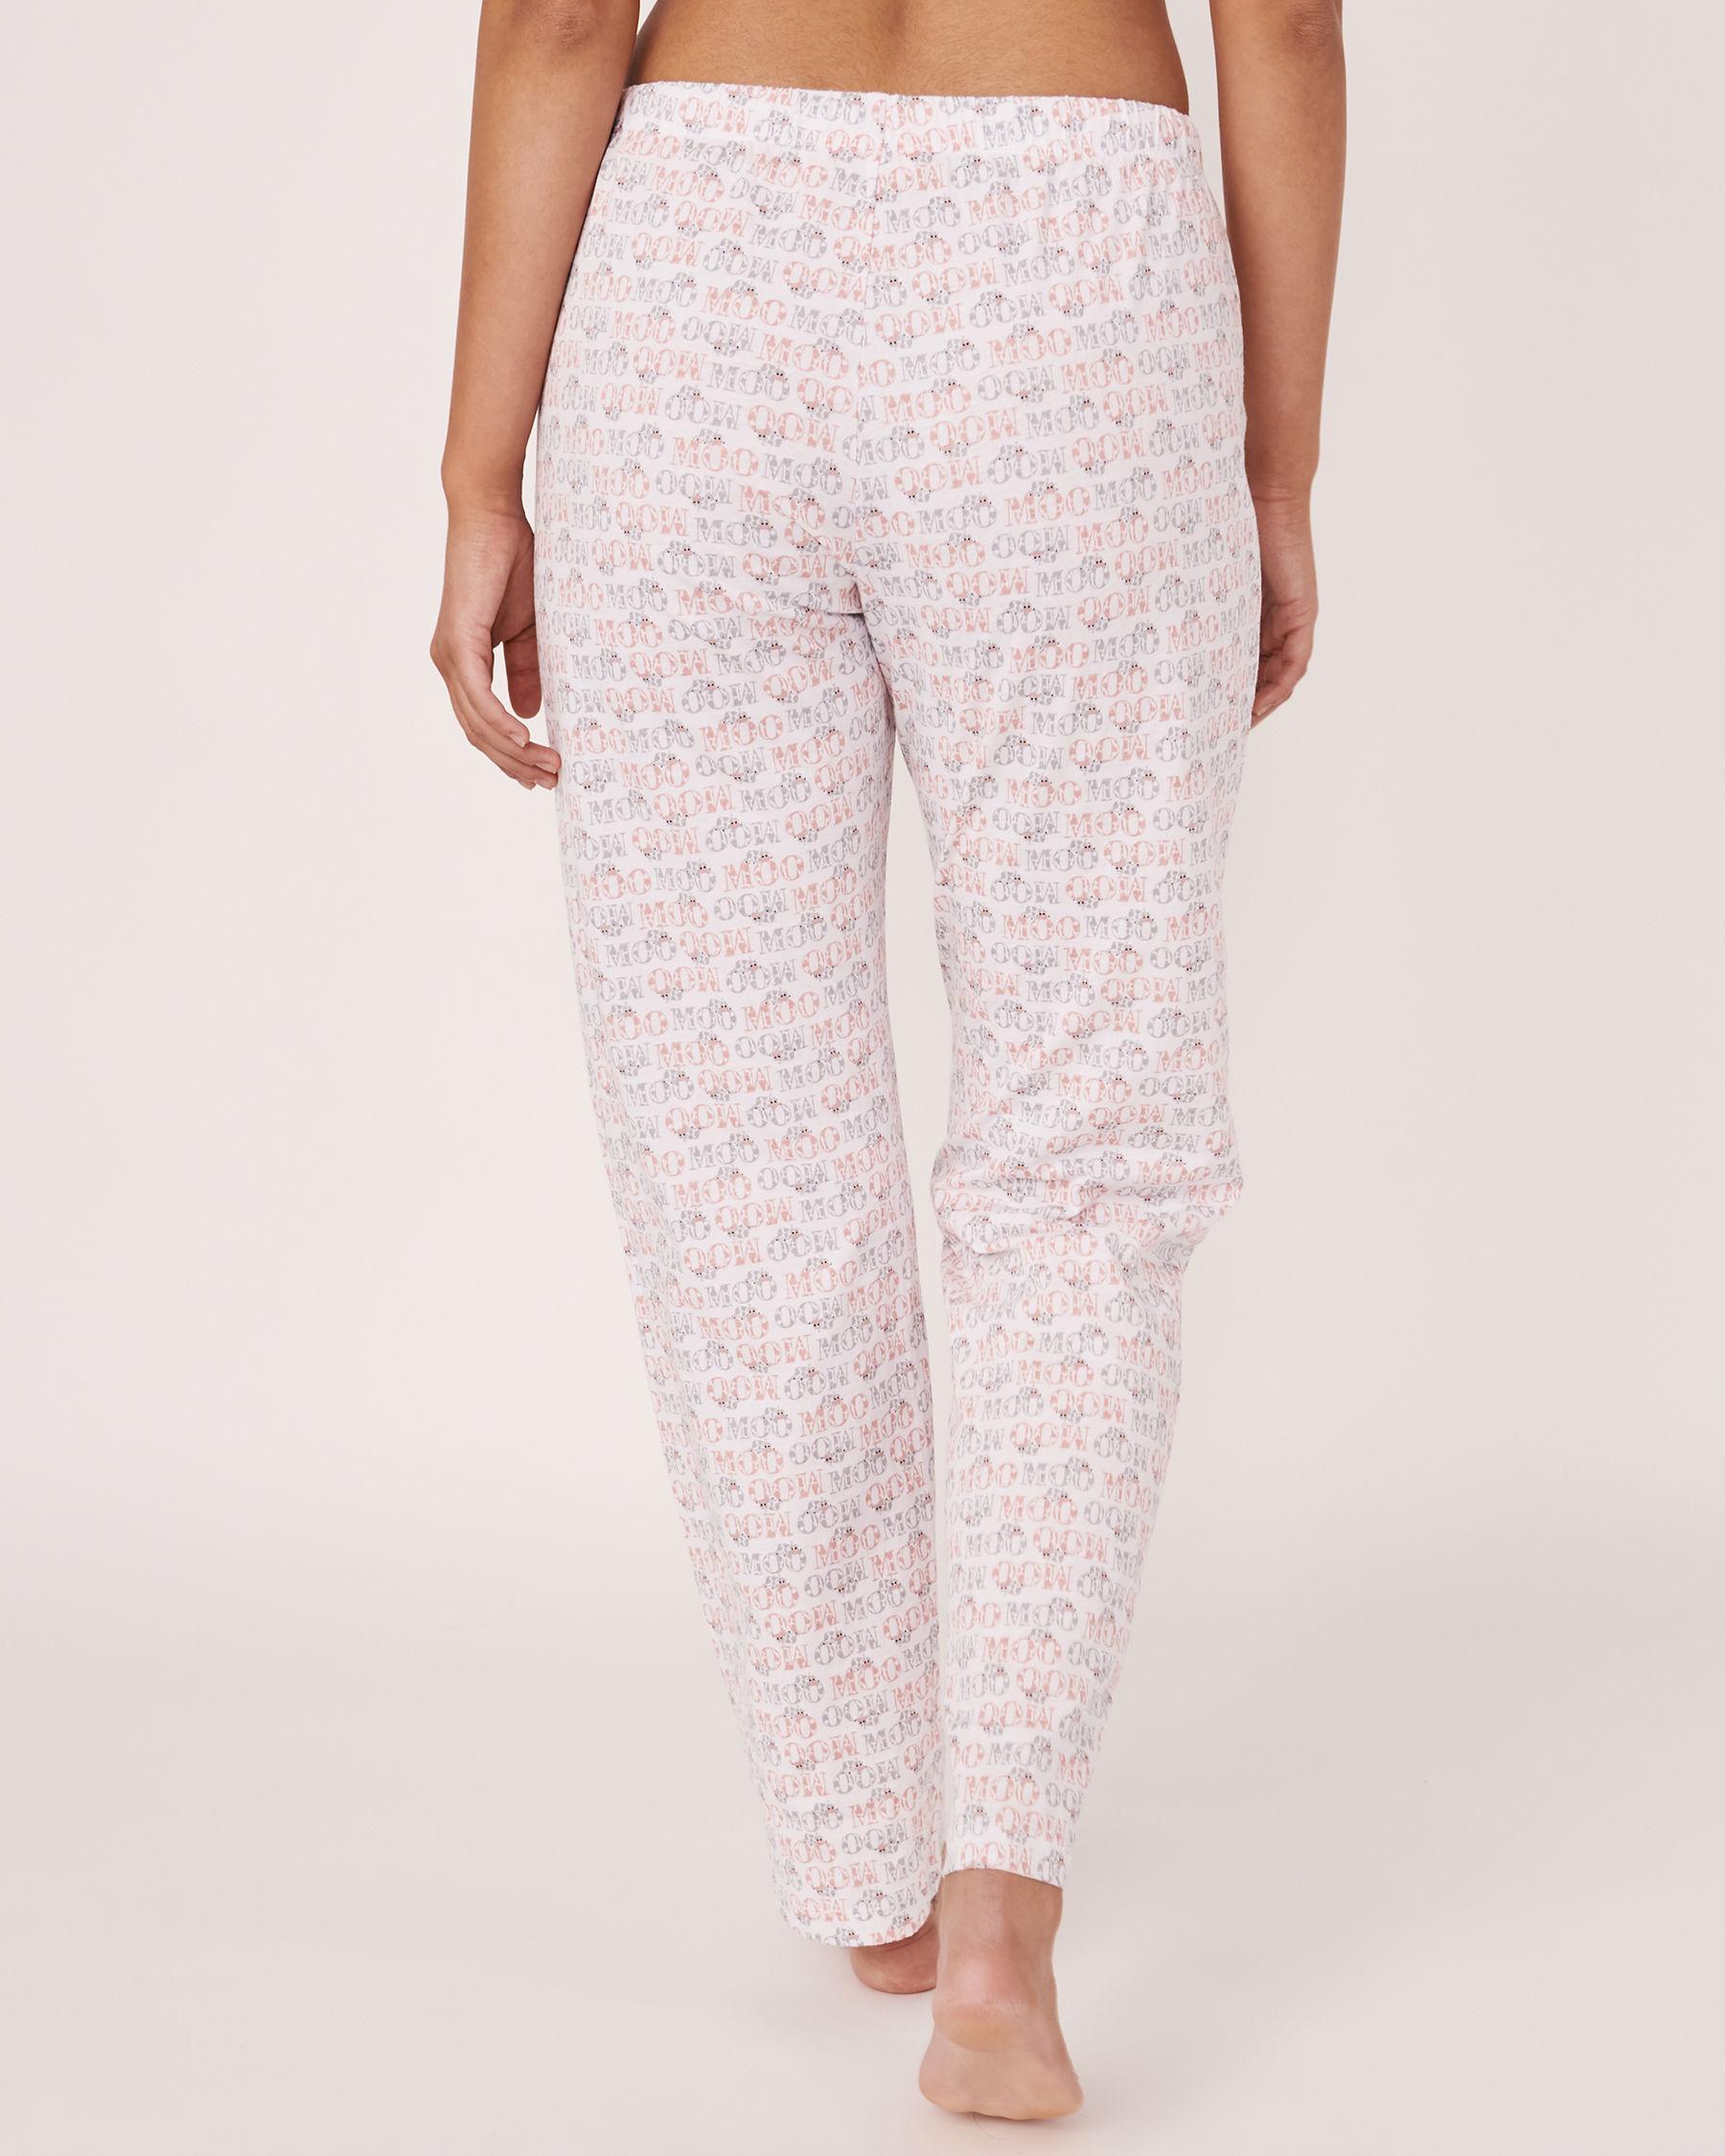 LA VIE EN ROSE Straight Leg Pyjama Pant MOO text 40200122 - View2